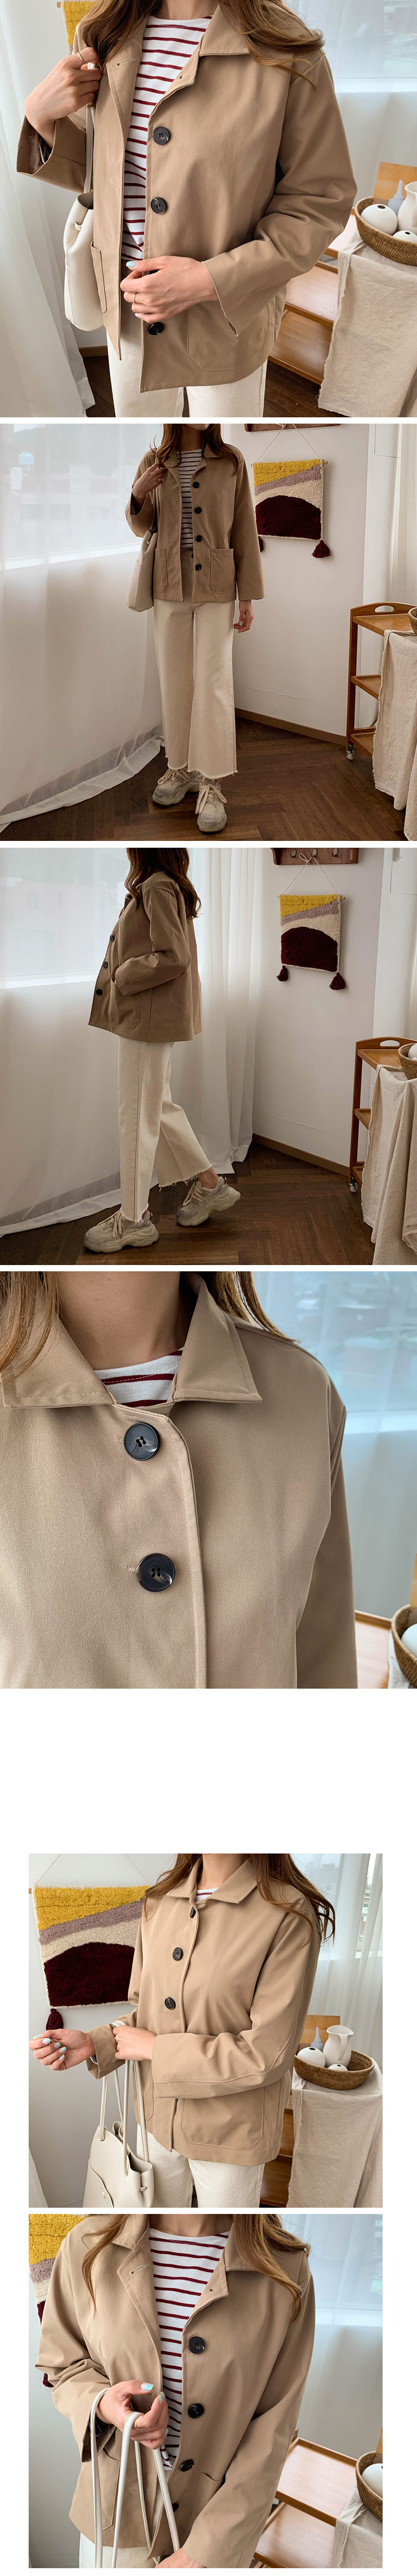 Pocket button night jacket